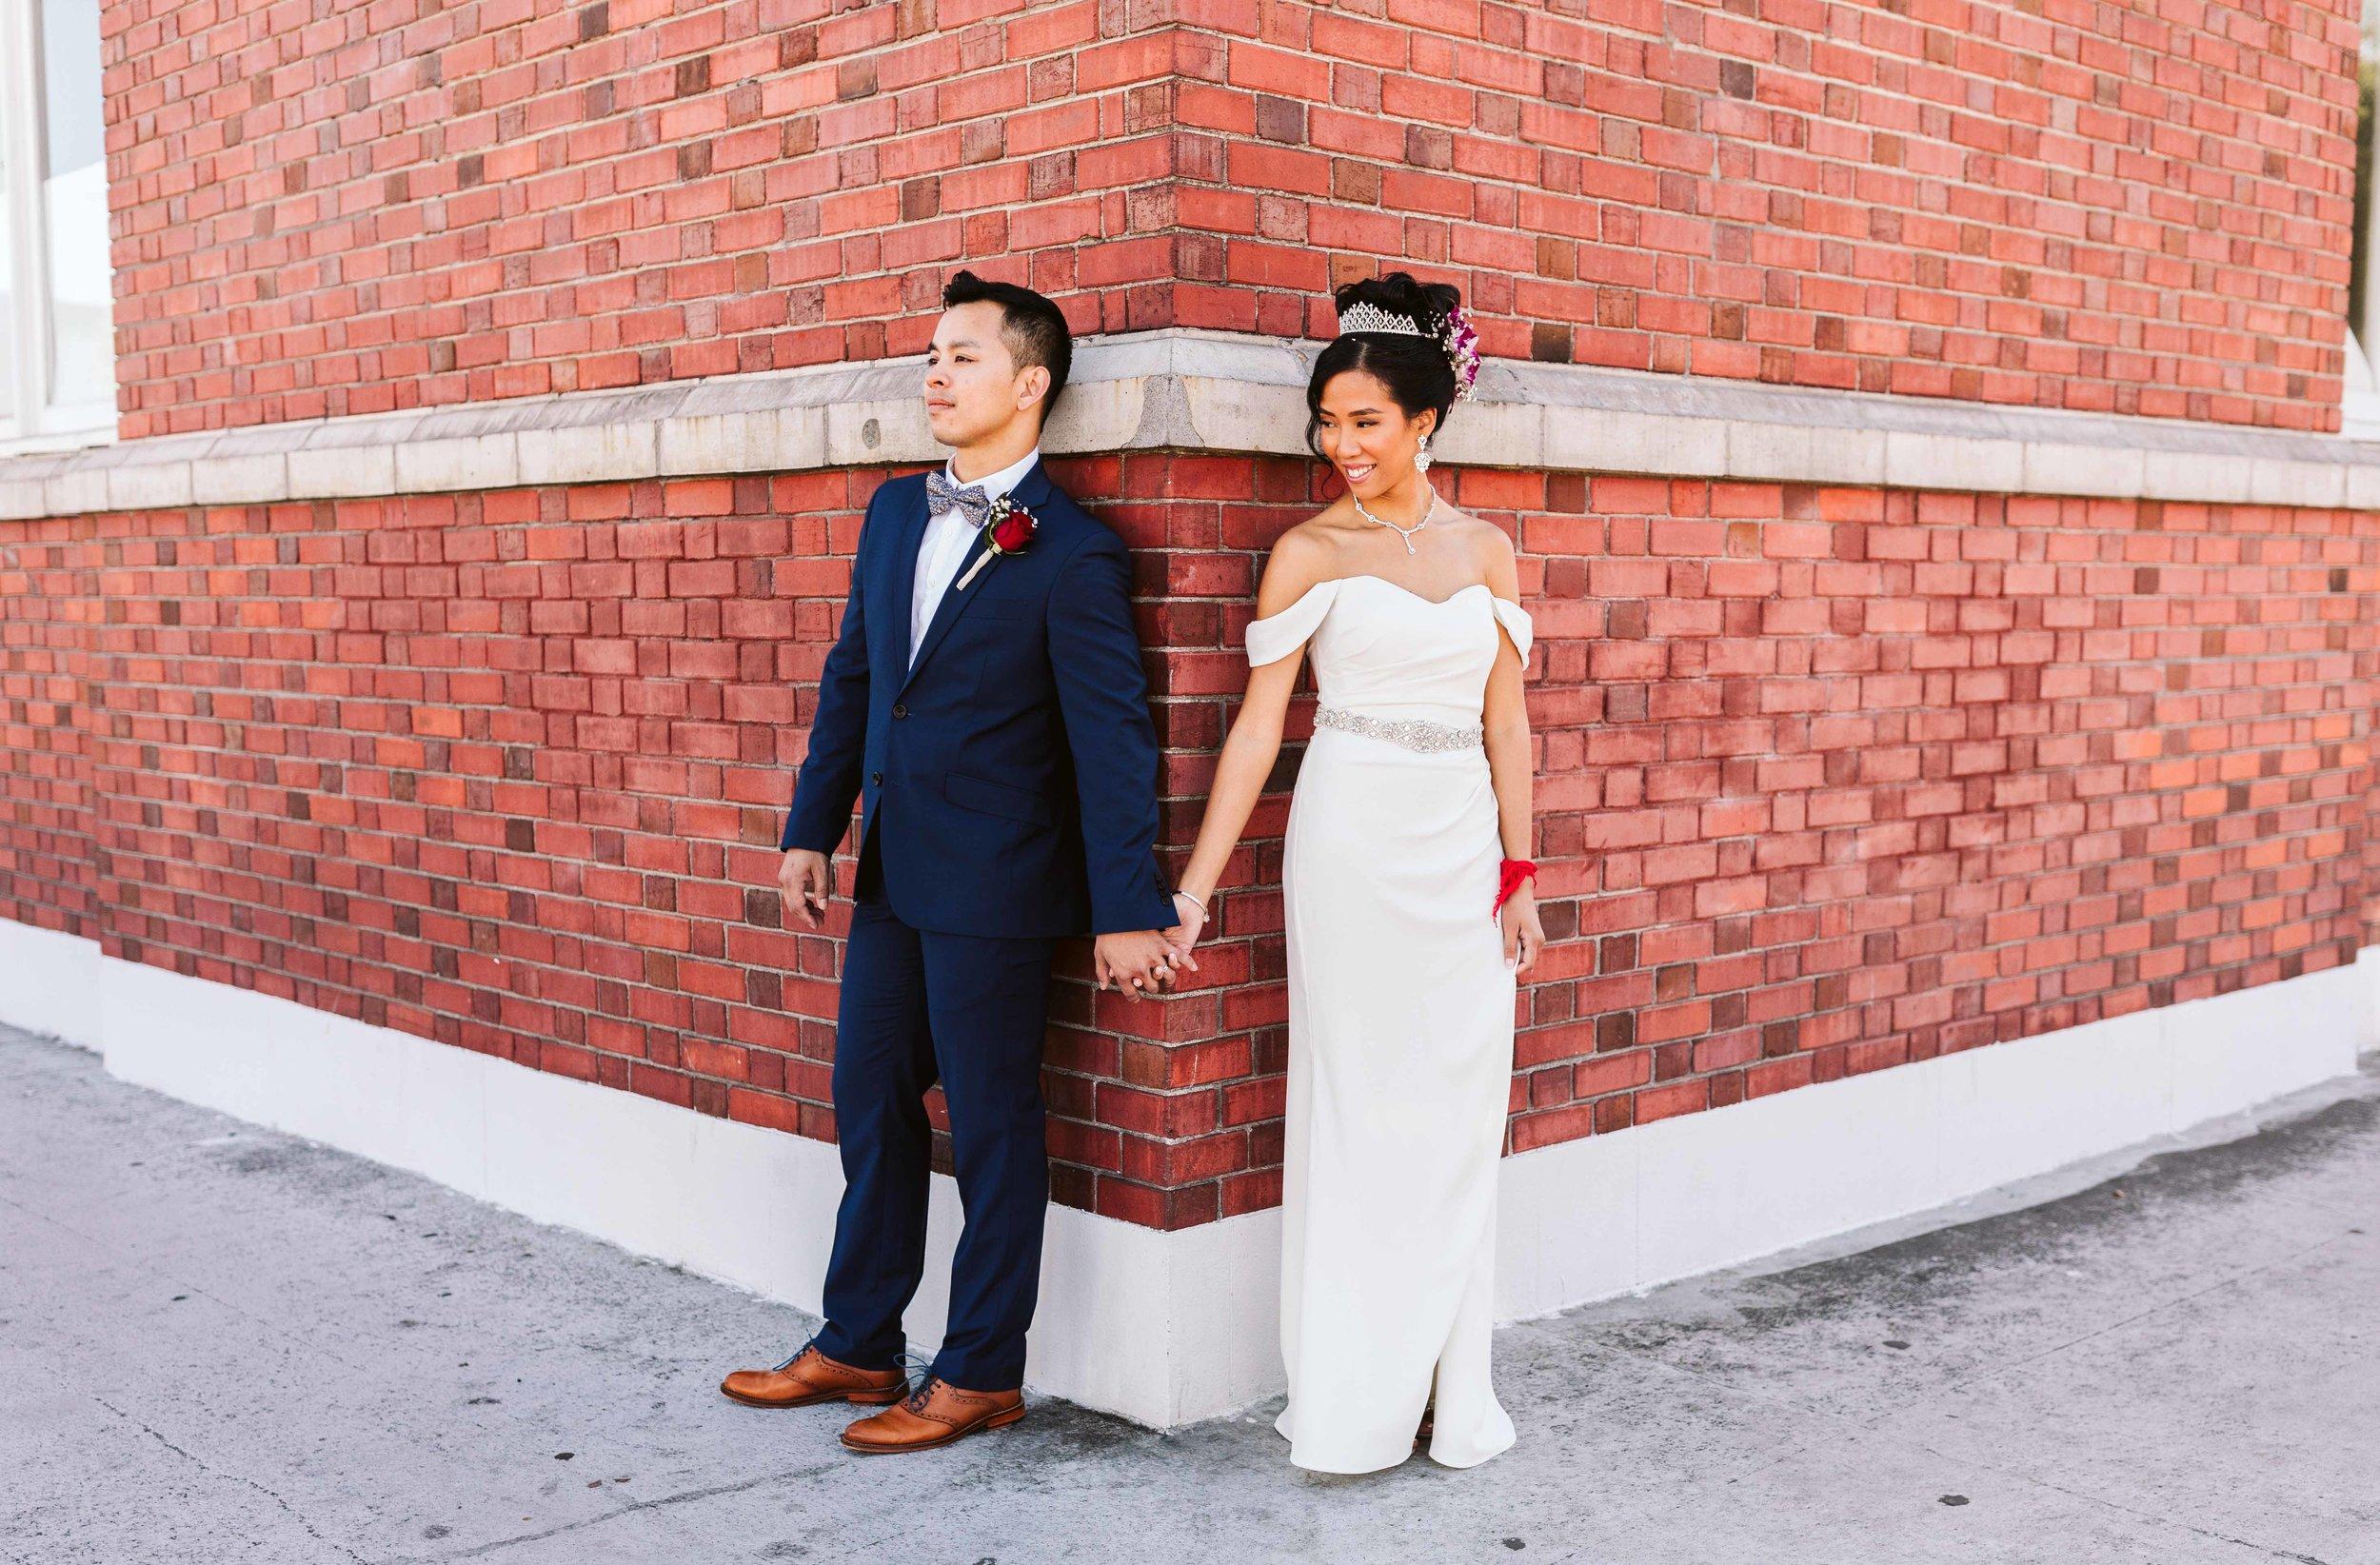 melody-ballroom-portland-wedding-86.jpg